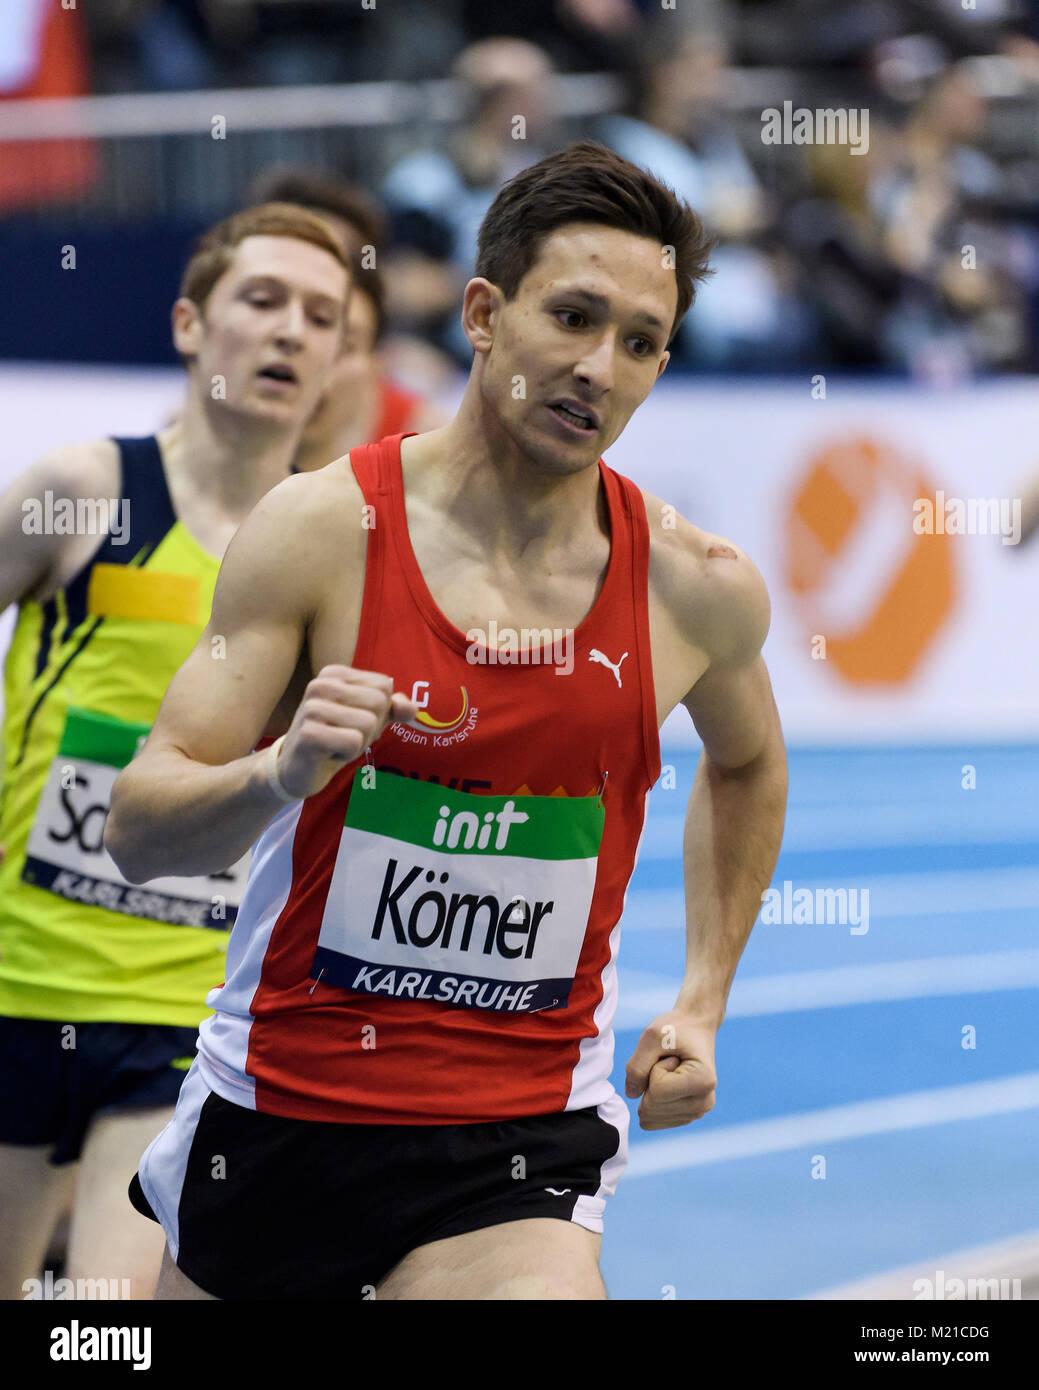 Karlsruhe, Deutschland. 03rd Feb, 2018. 1500m U16 Regional maennlich: Holger Koerner (LG Region Karlsruhe). GES/ - Stock Image